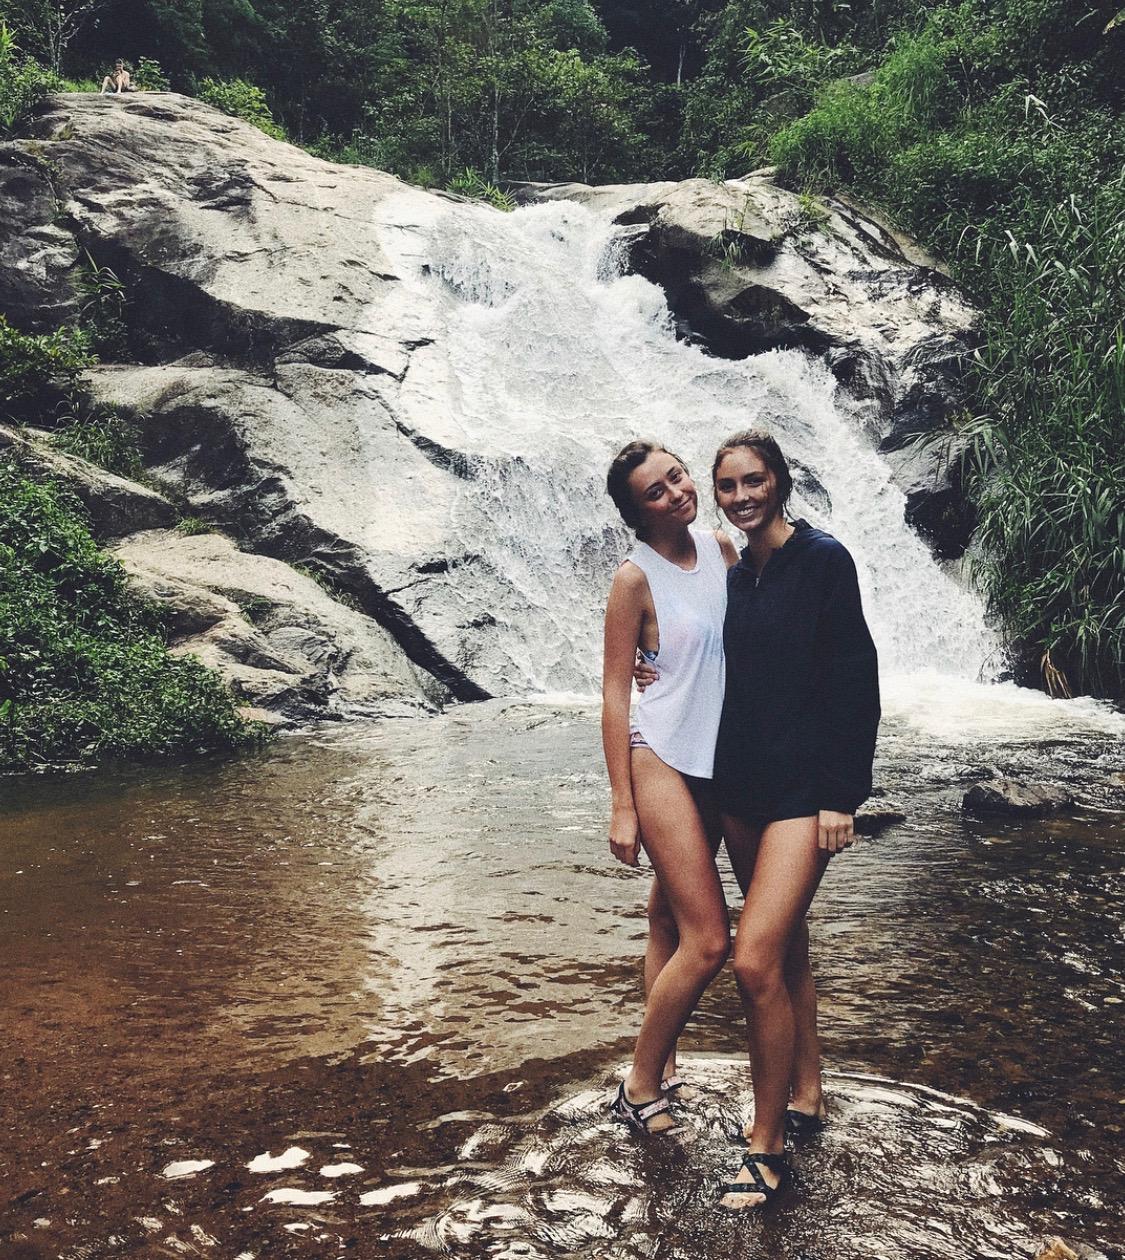 waterfalls2-2.jpg